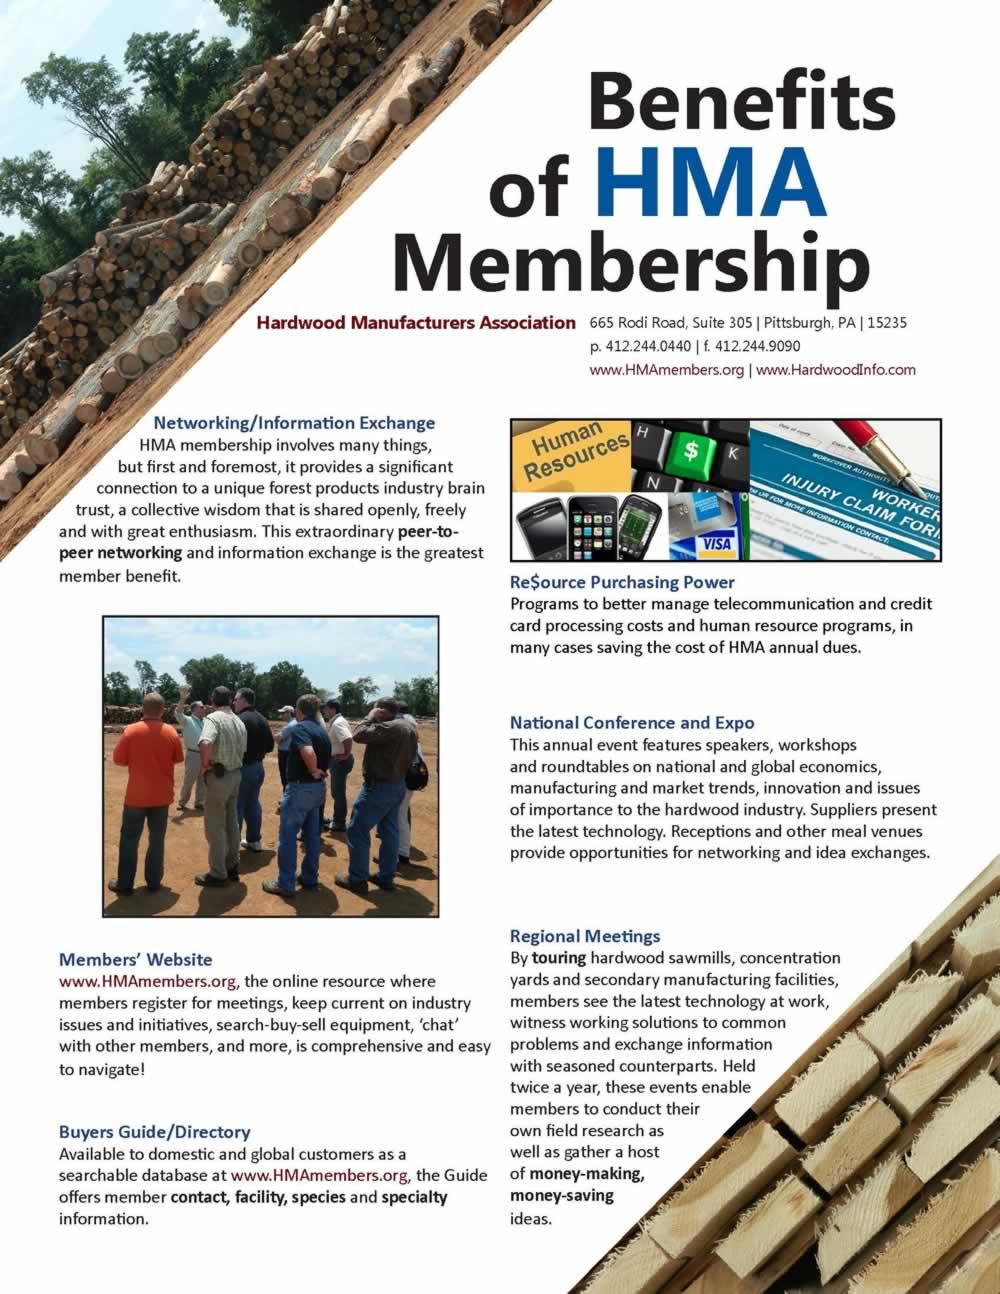 Benefits of HMA Membership